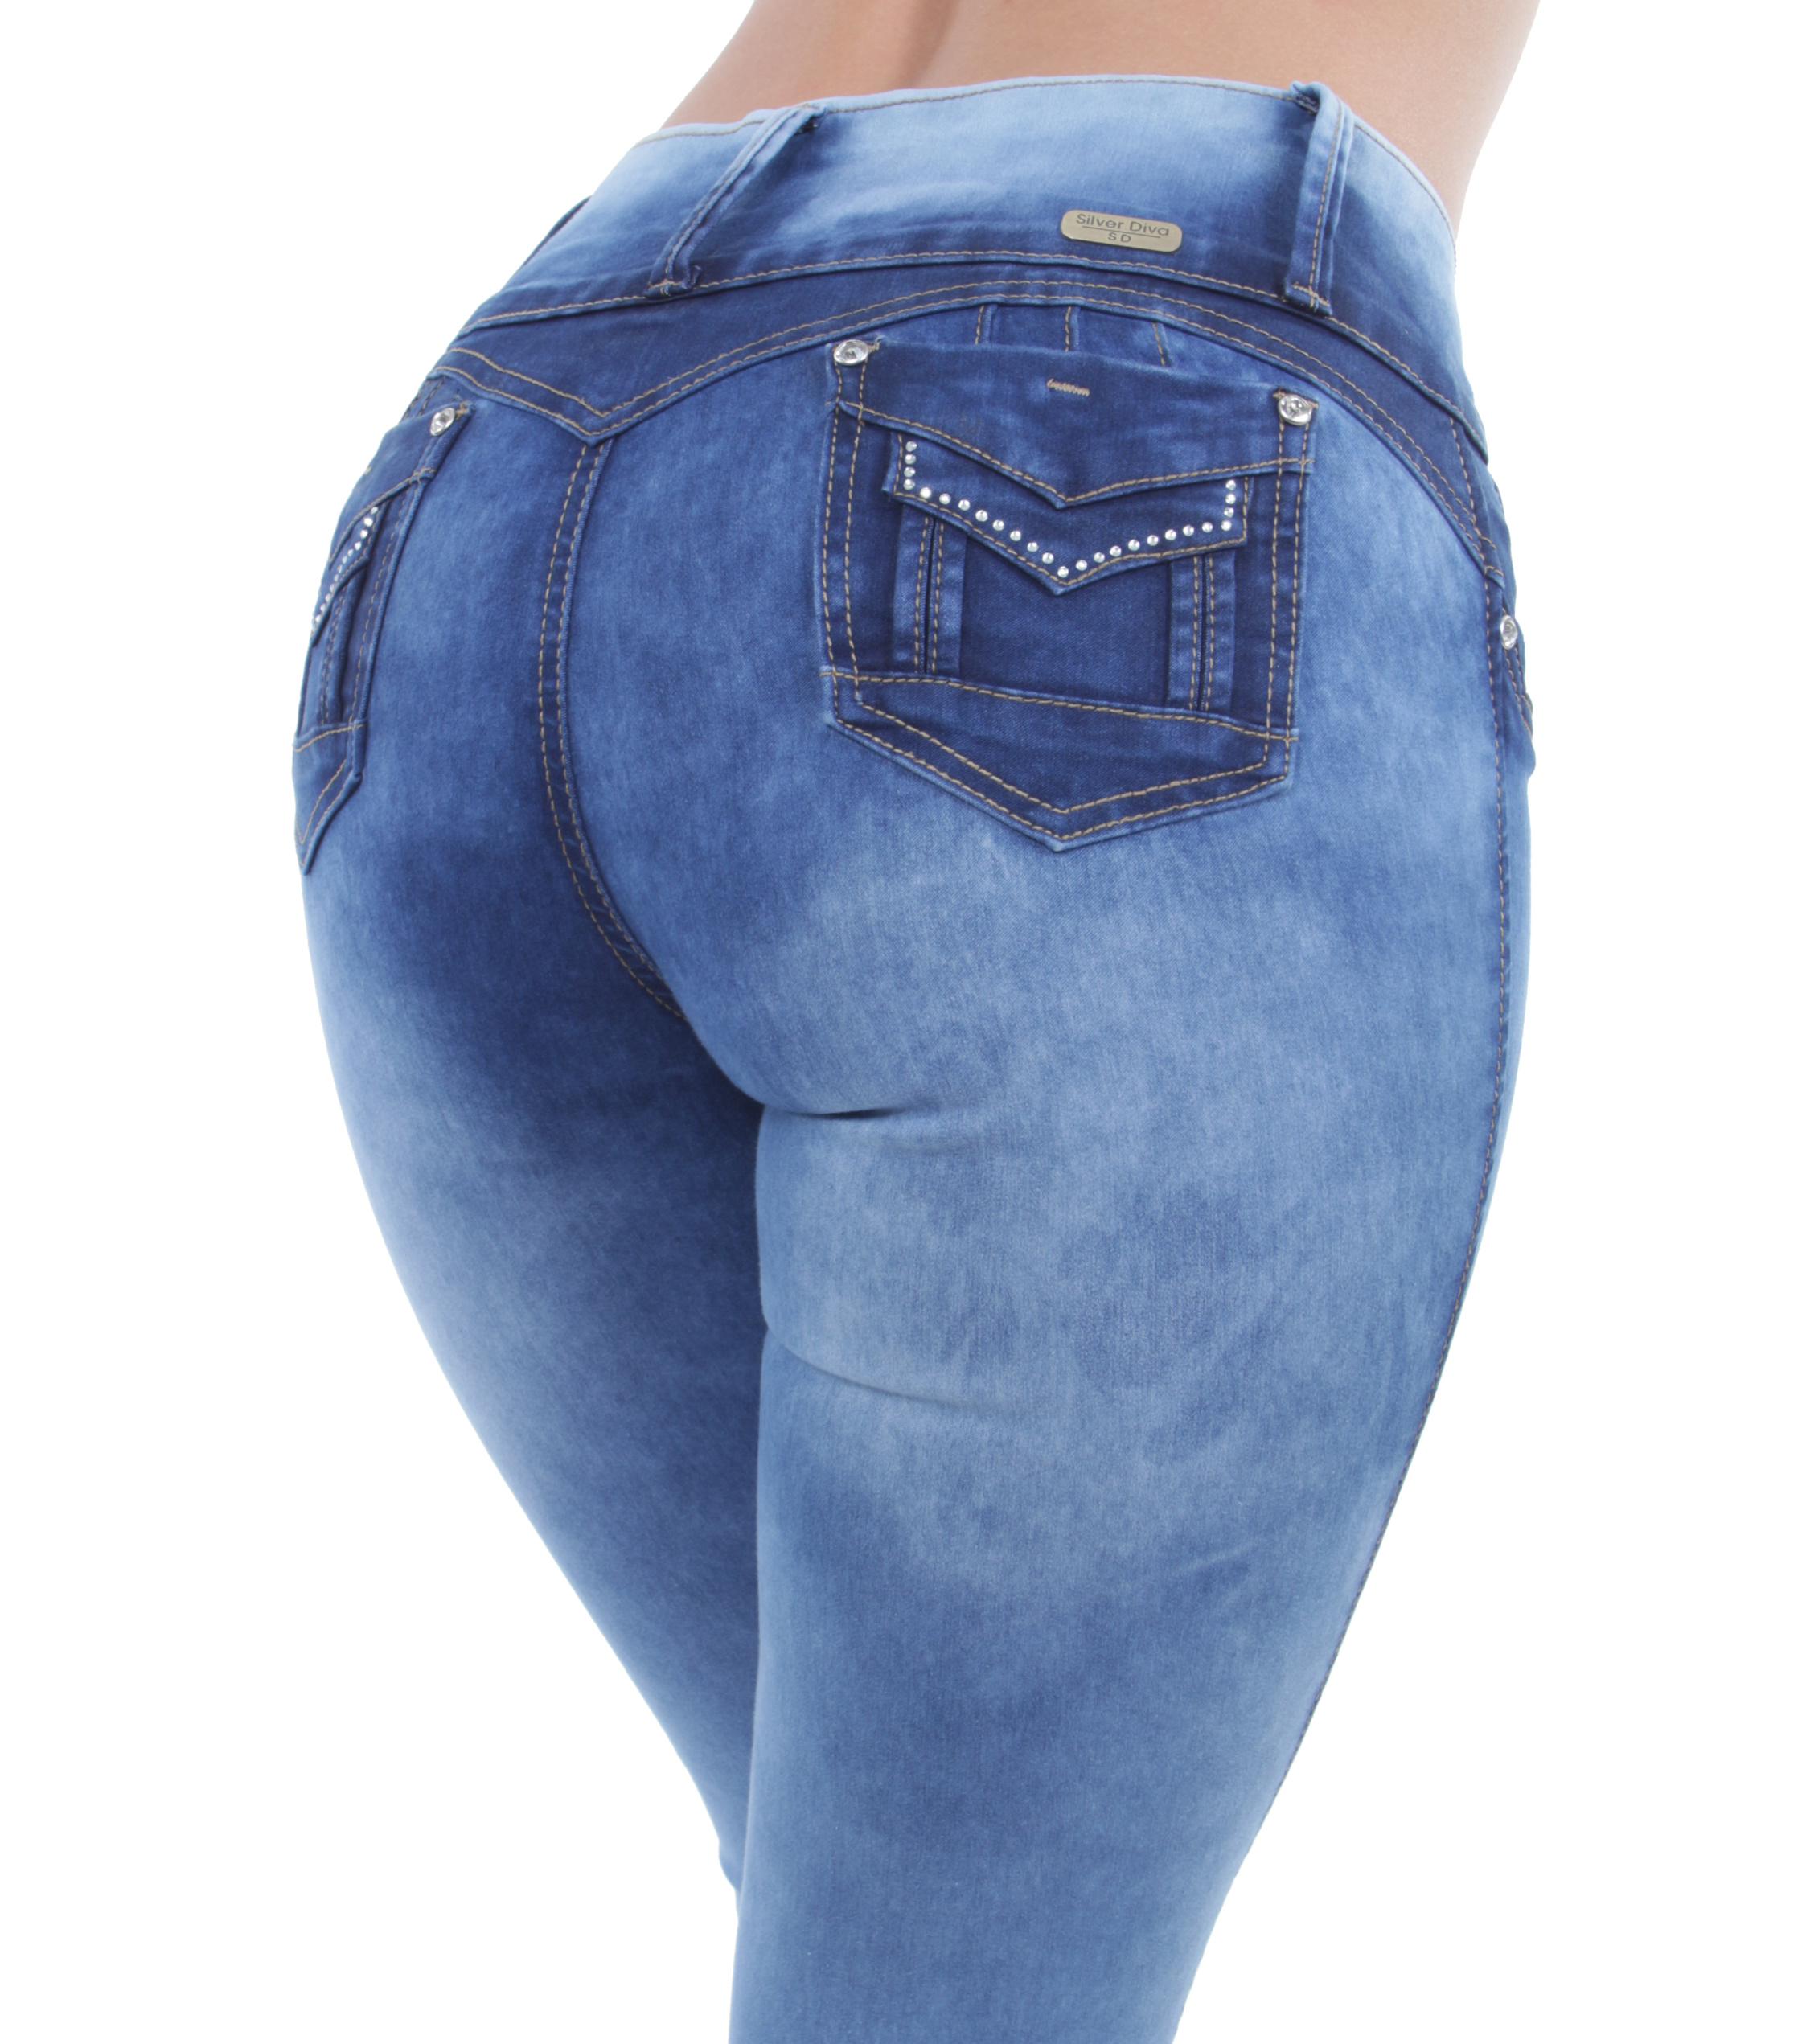 Butt Lift Mid Waist Women/'s Juniors Colombian Design Push Up Skinny Jeans